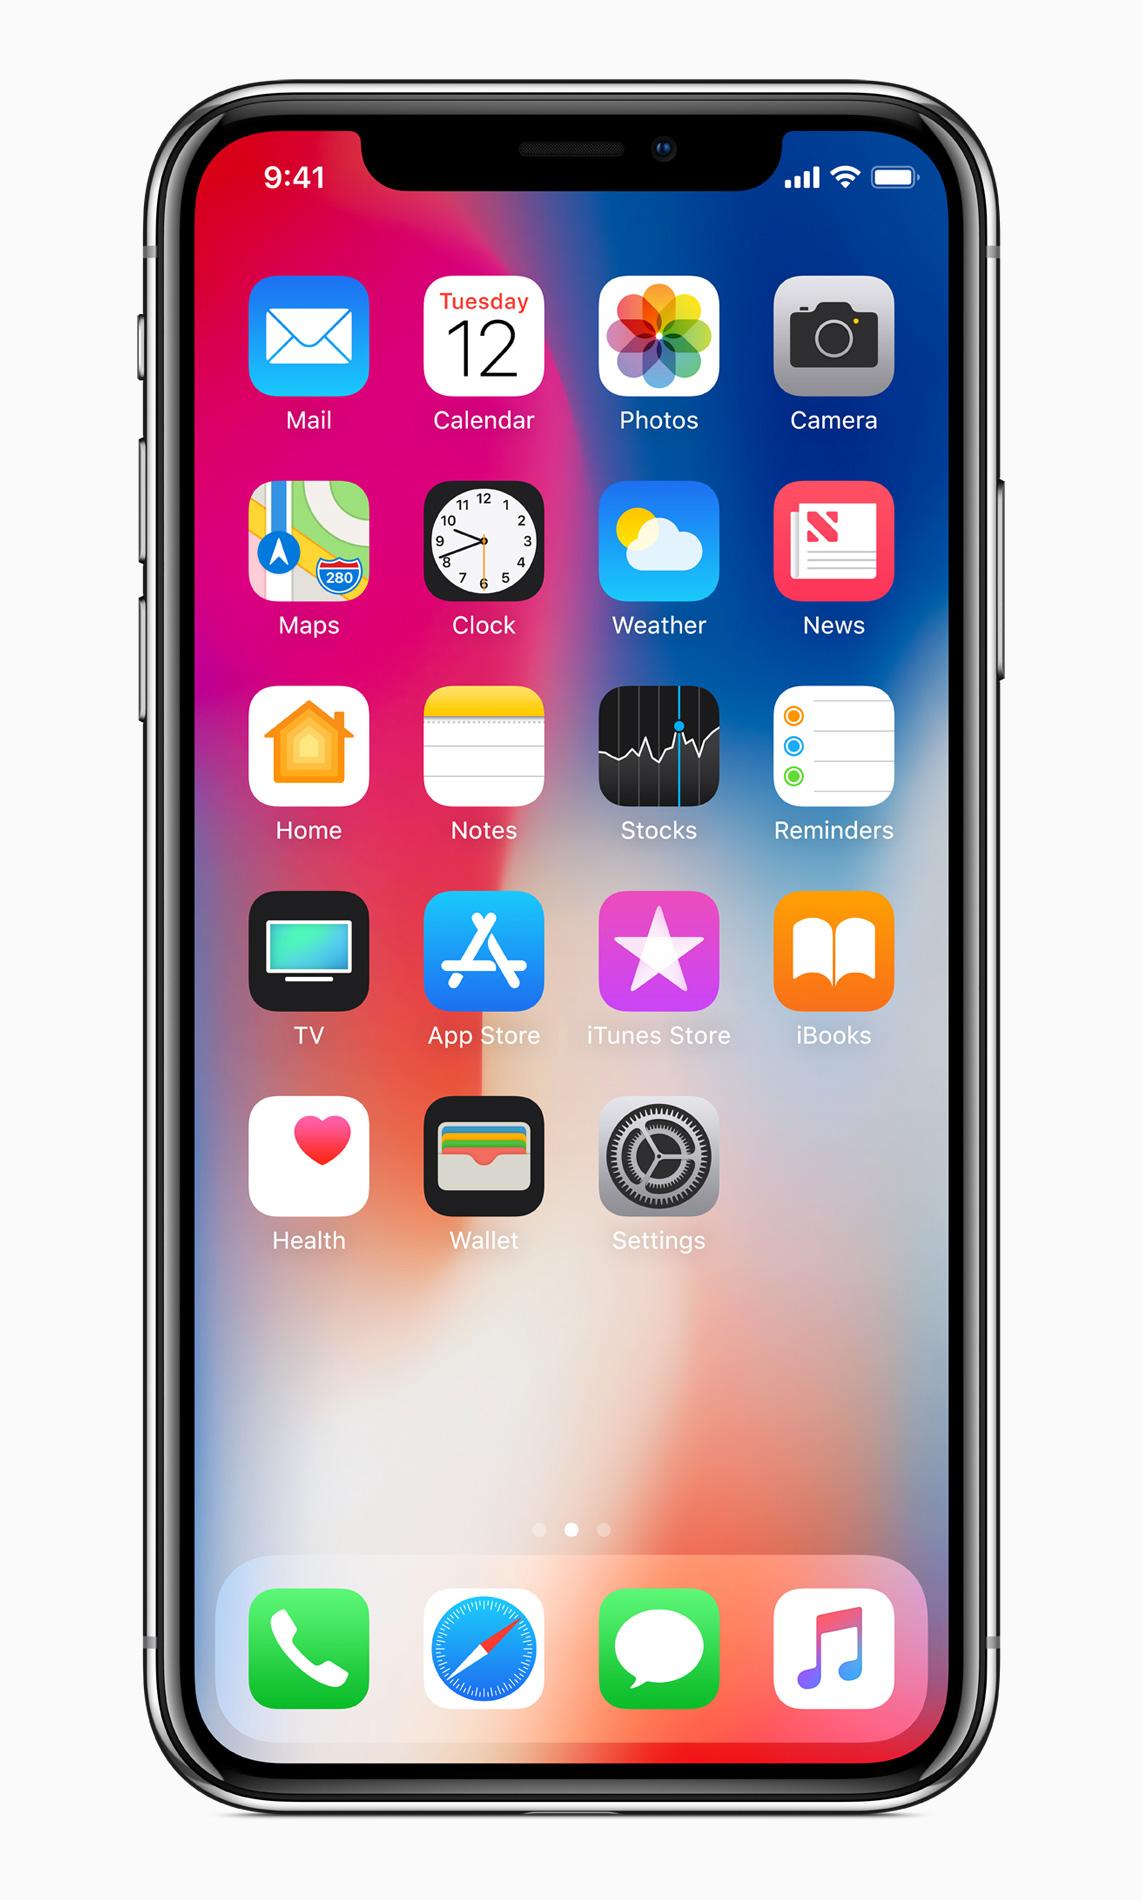 iphonex_front_homescreen.jpg